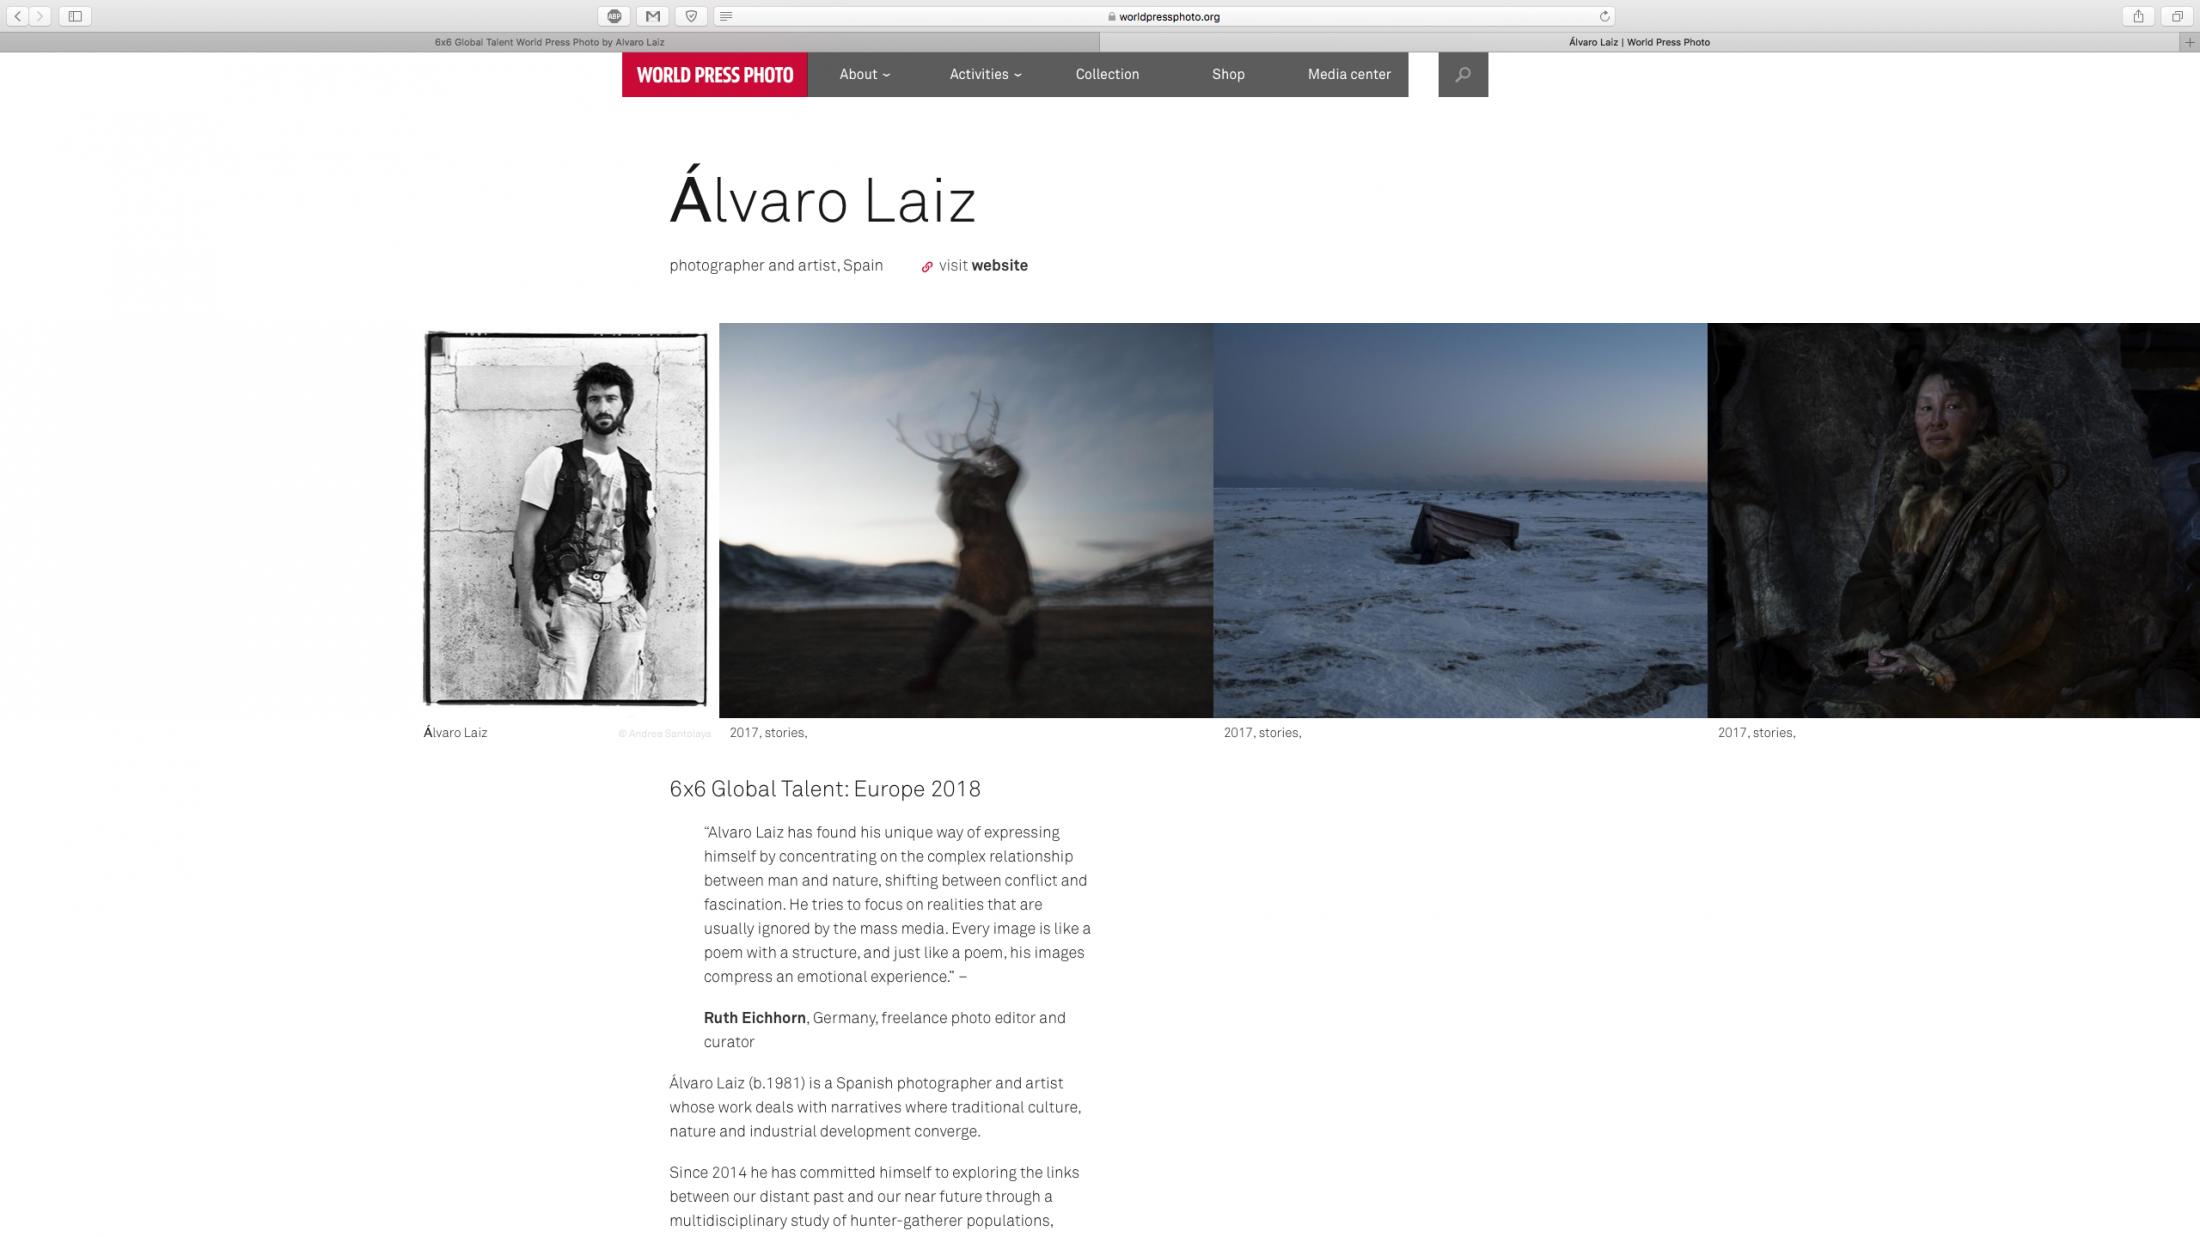 Art and Documentary Photography - Loading Captura_de_pantalla_2018-06-23_a_las_12.30.33.png